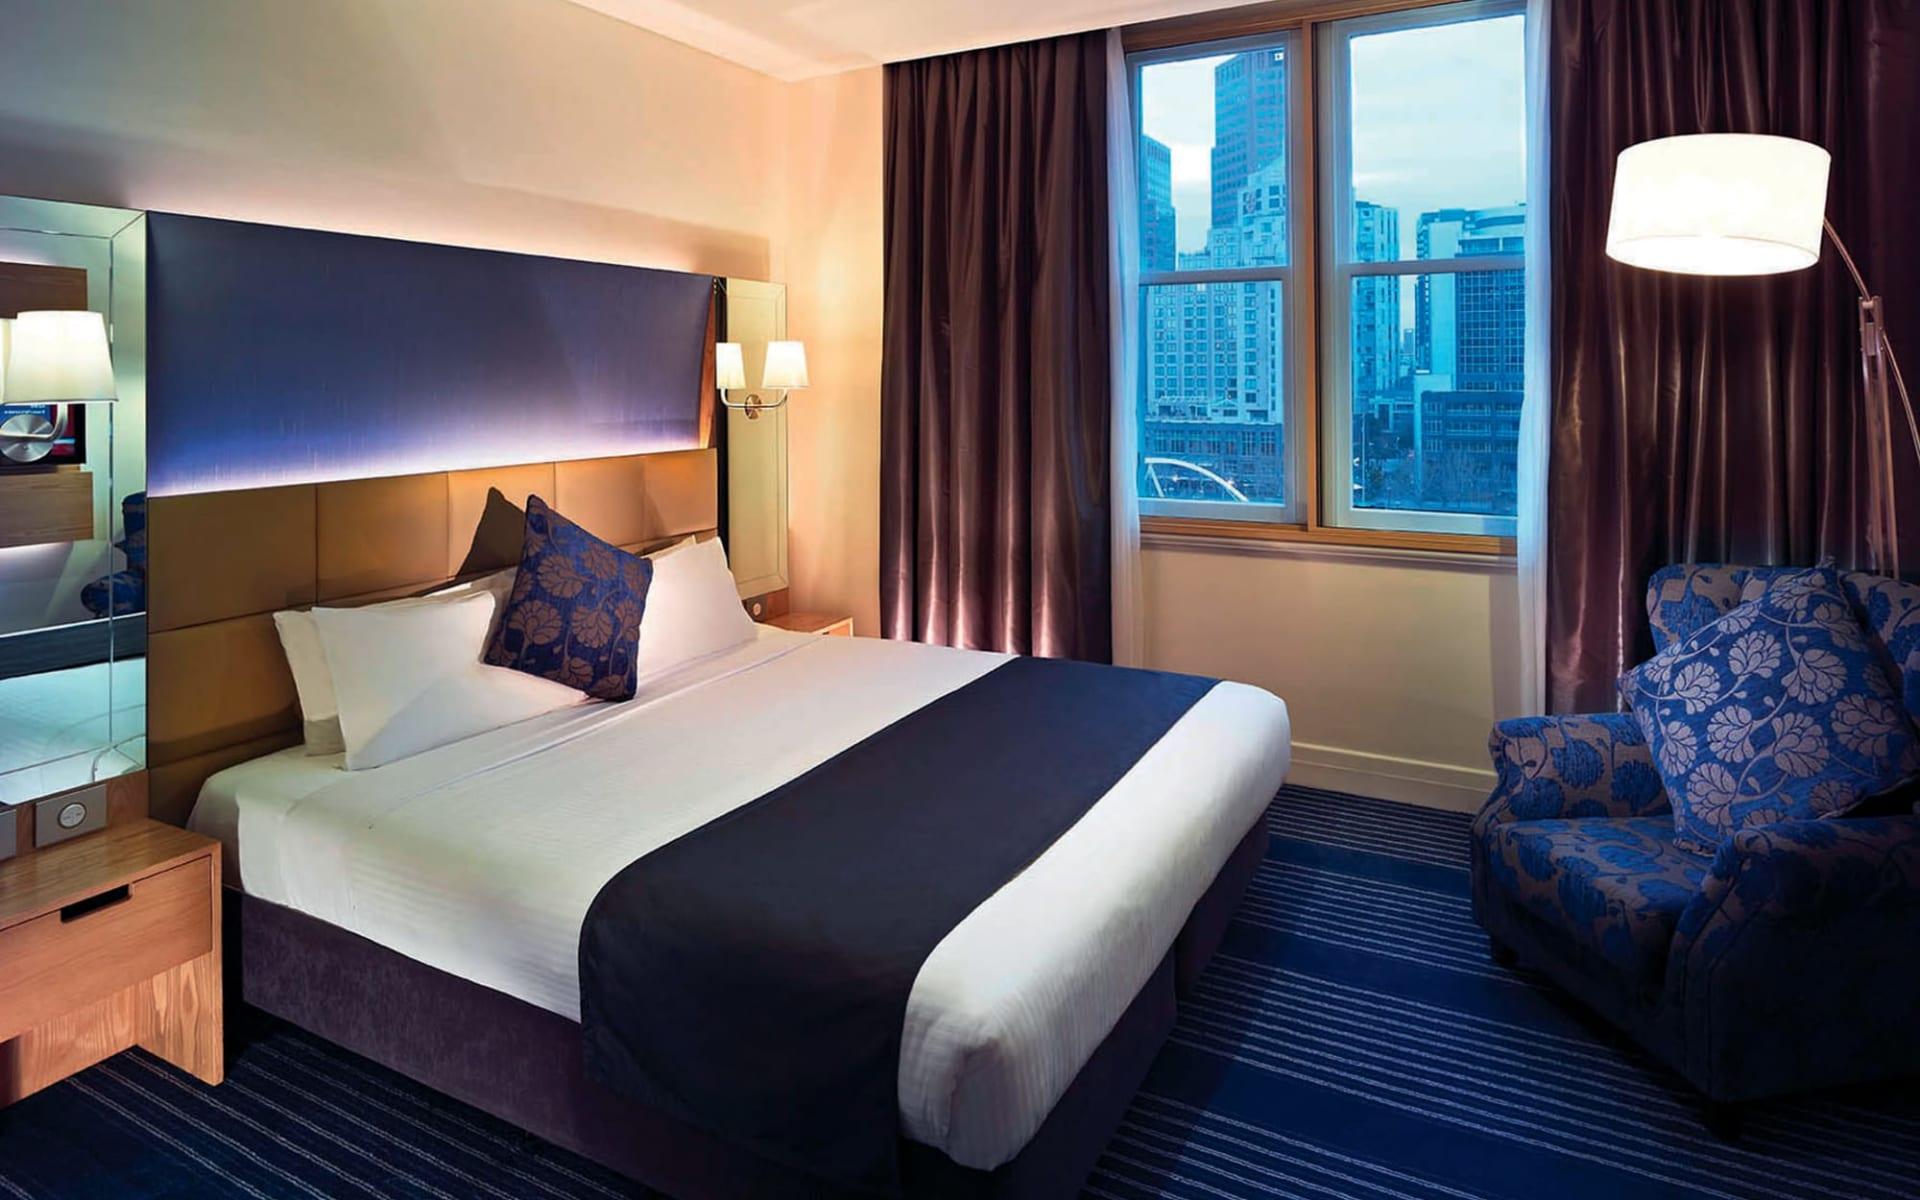 Rendezvous Hotel Melbourne:  Rendezvous Hotel Melbourne - Deluxe Room